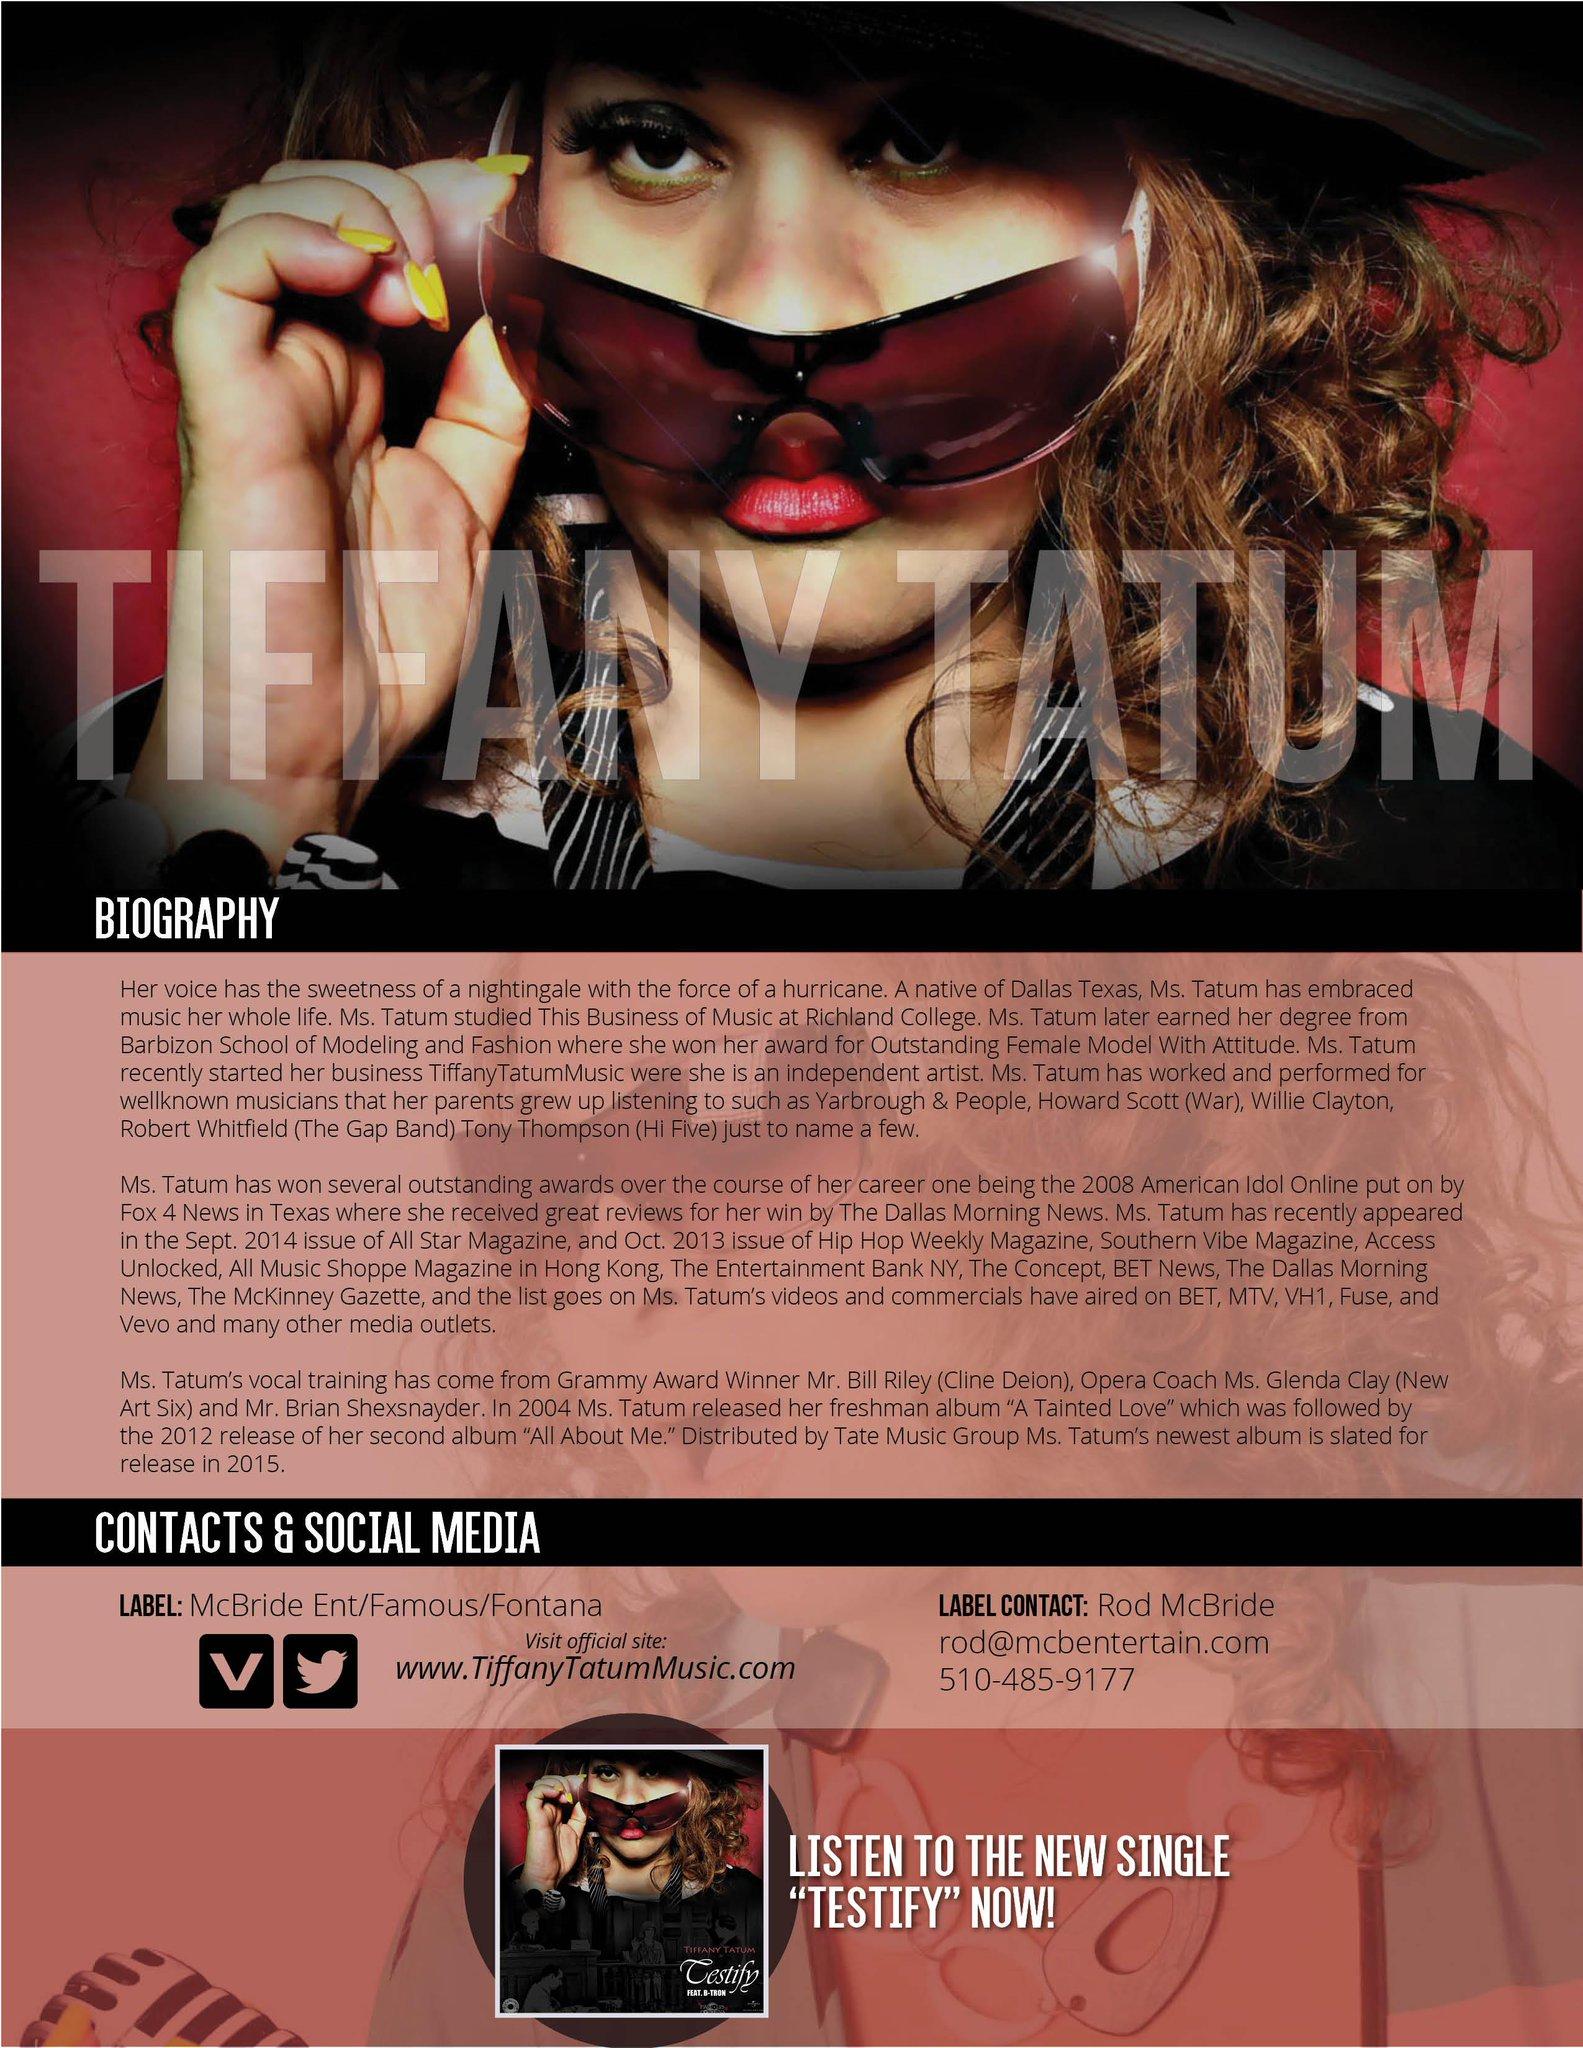 Dj Bankrupt On Twitter Newsong 1773 Tiffany Tatum Testify Via Mcbentertain On Mmmradio Http T Co Jwjpmdk5iw Http T Co 2idtl3sybr